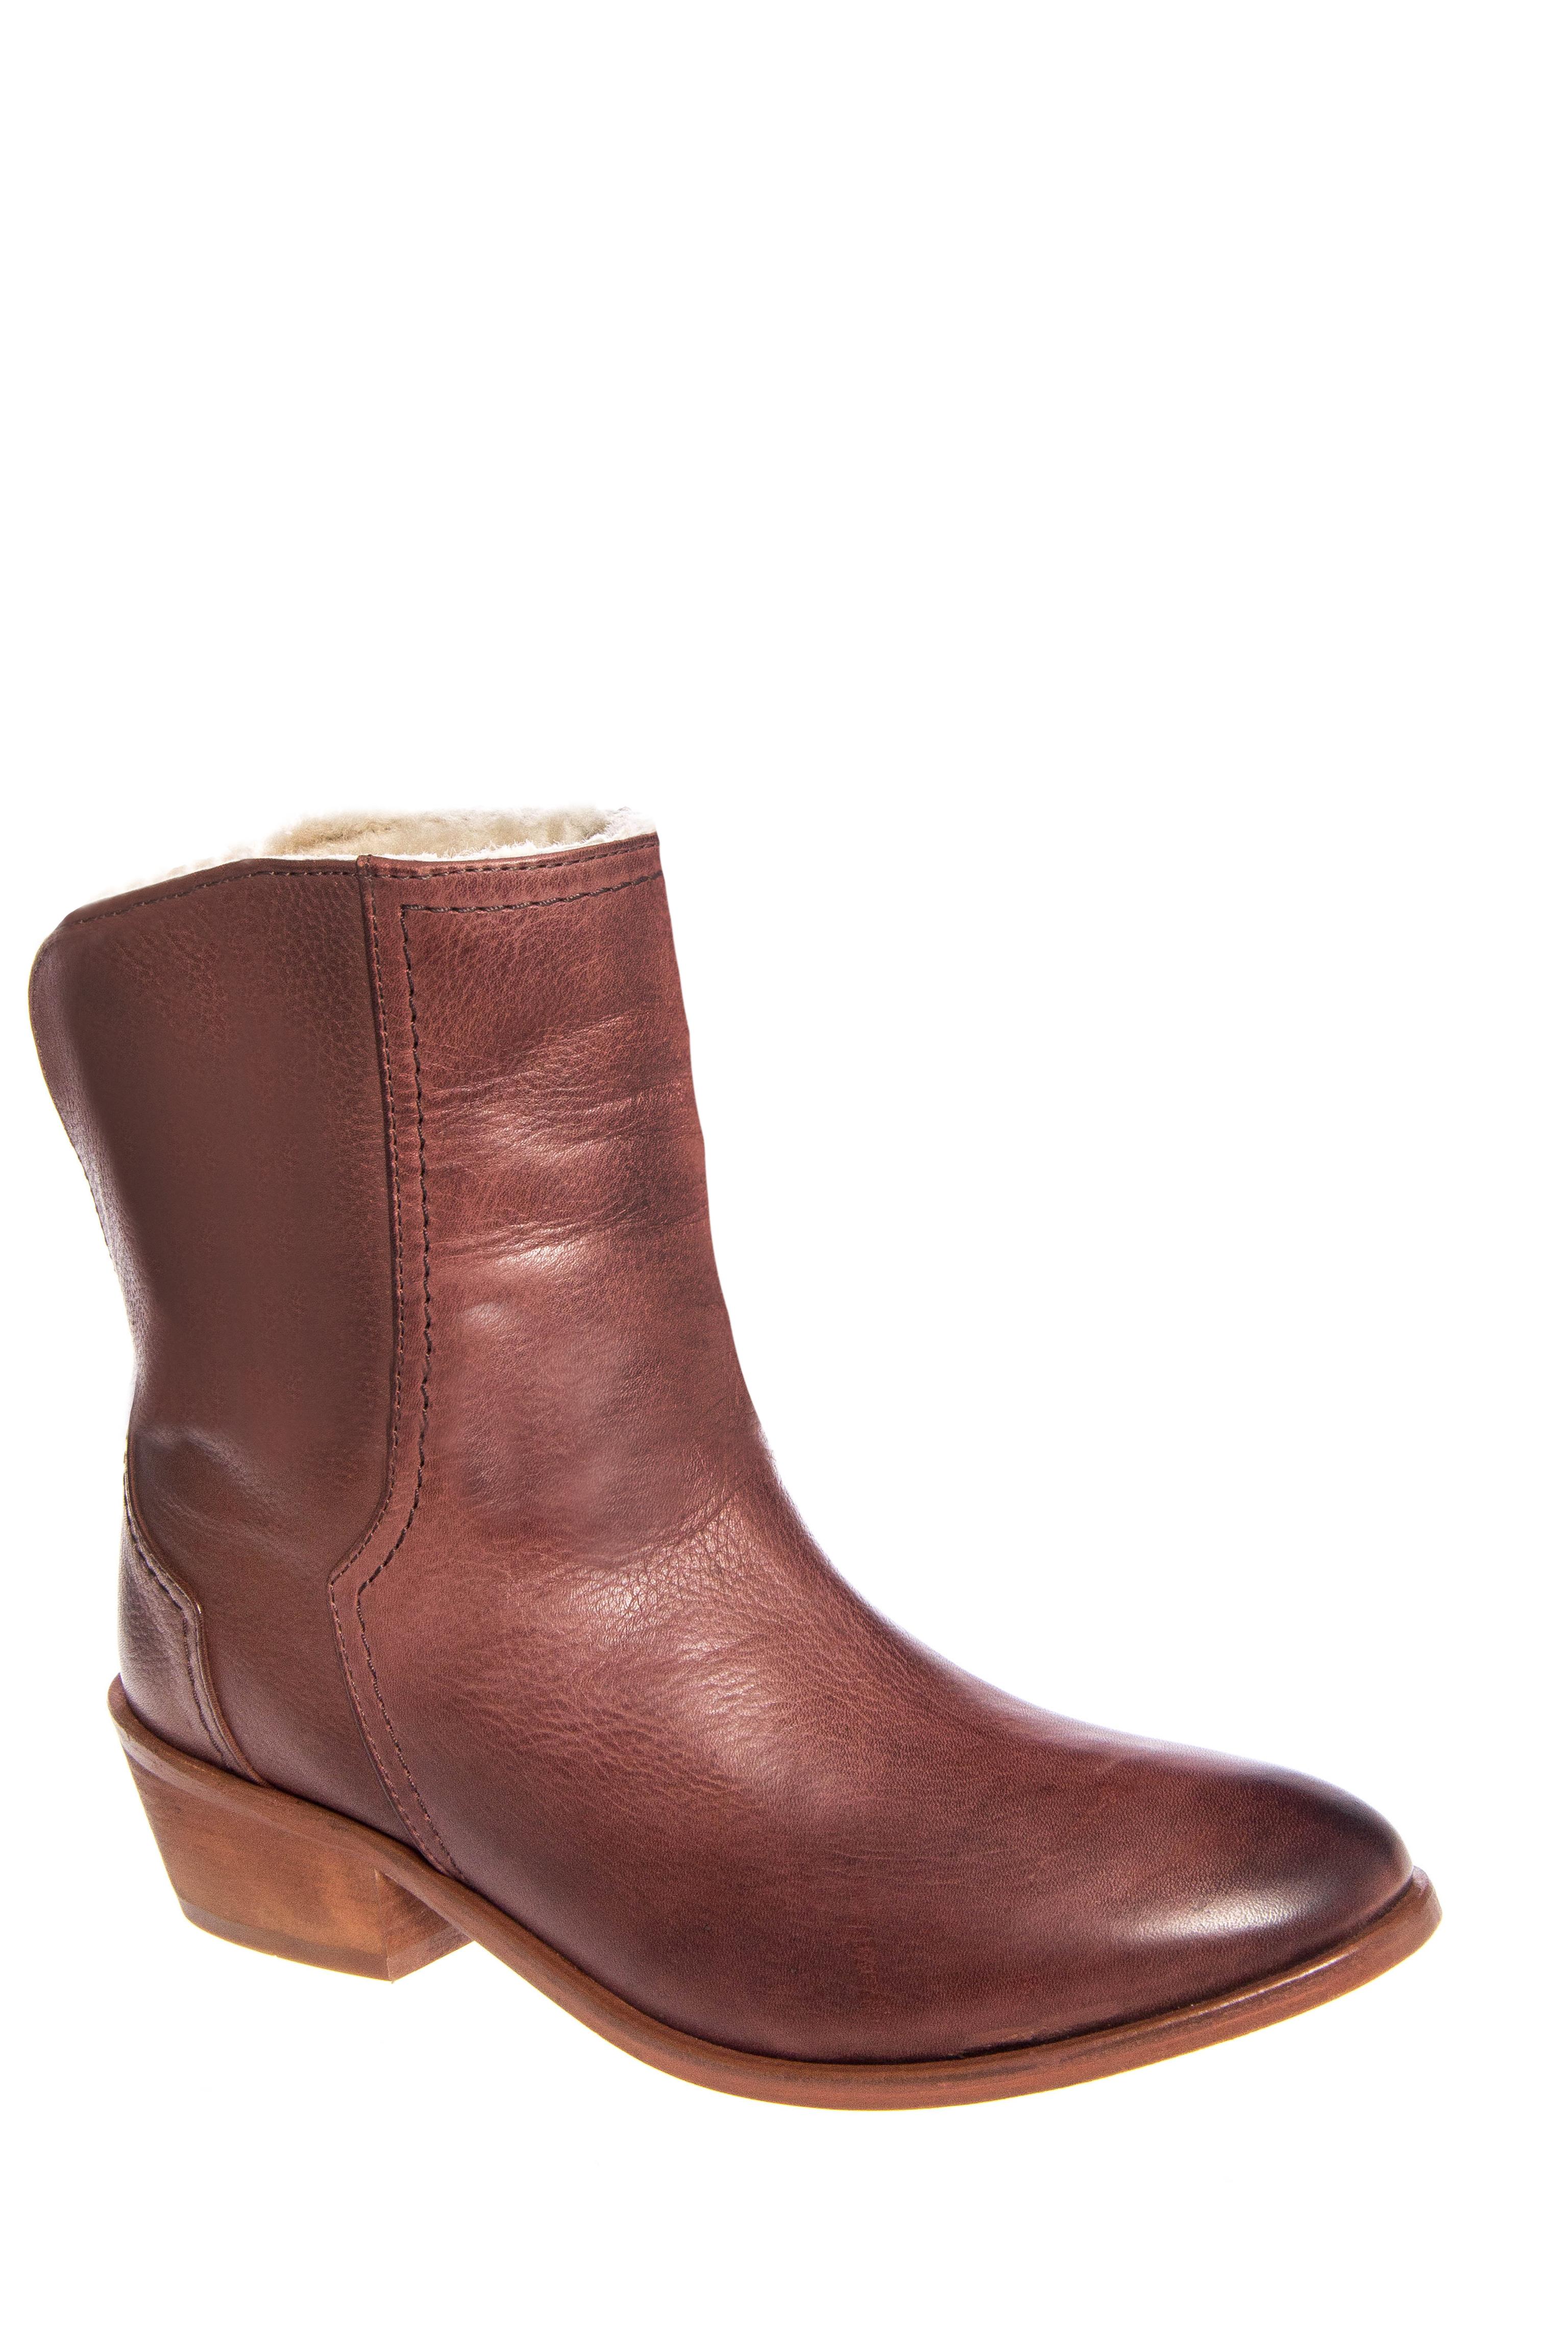 H By Hudson Salli Low Heel Booties - Chocolate